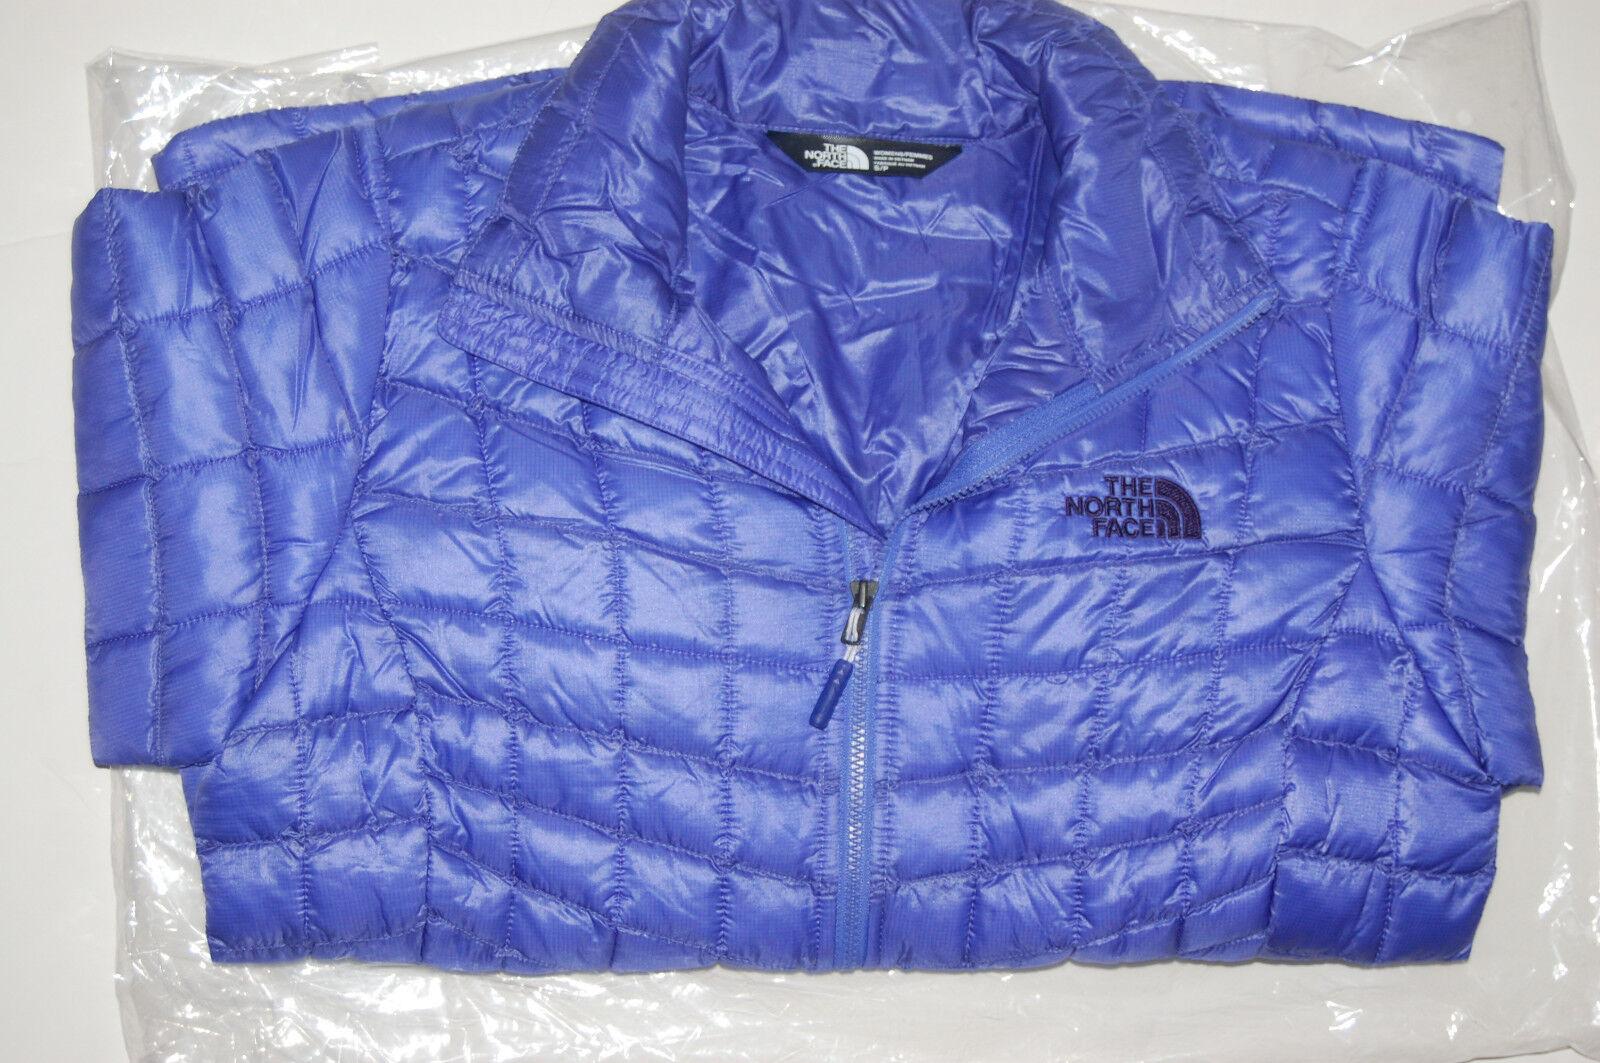 The North Face Mujer ThermoBall Full Zip chaqueta  aislante Tamaños estrellado púrpura  precios mas baratos